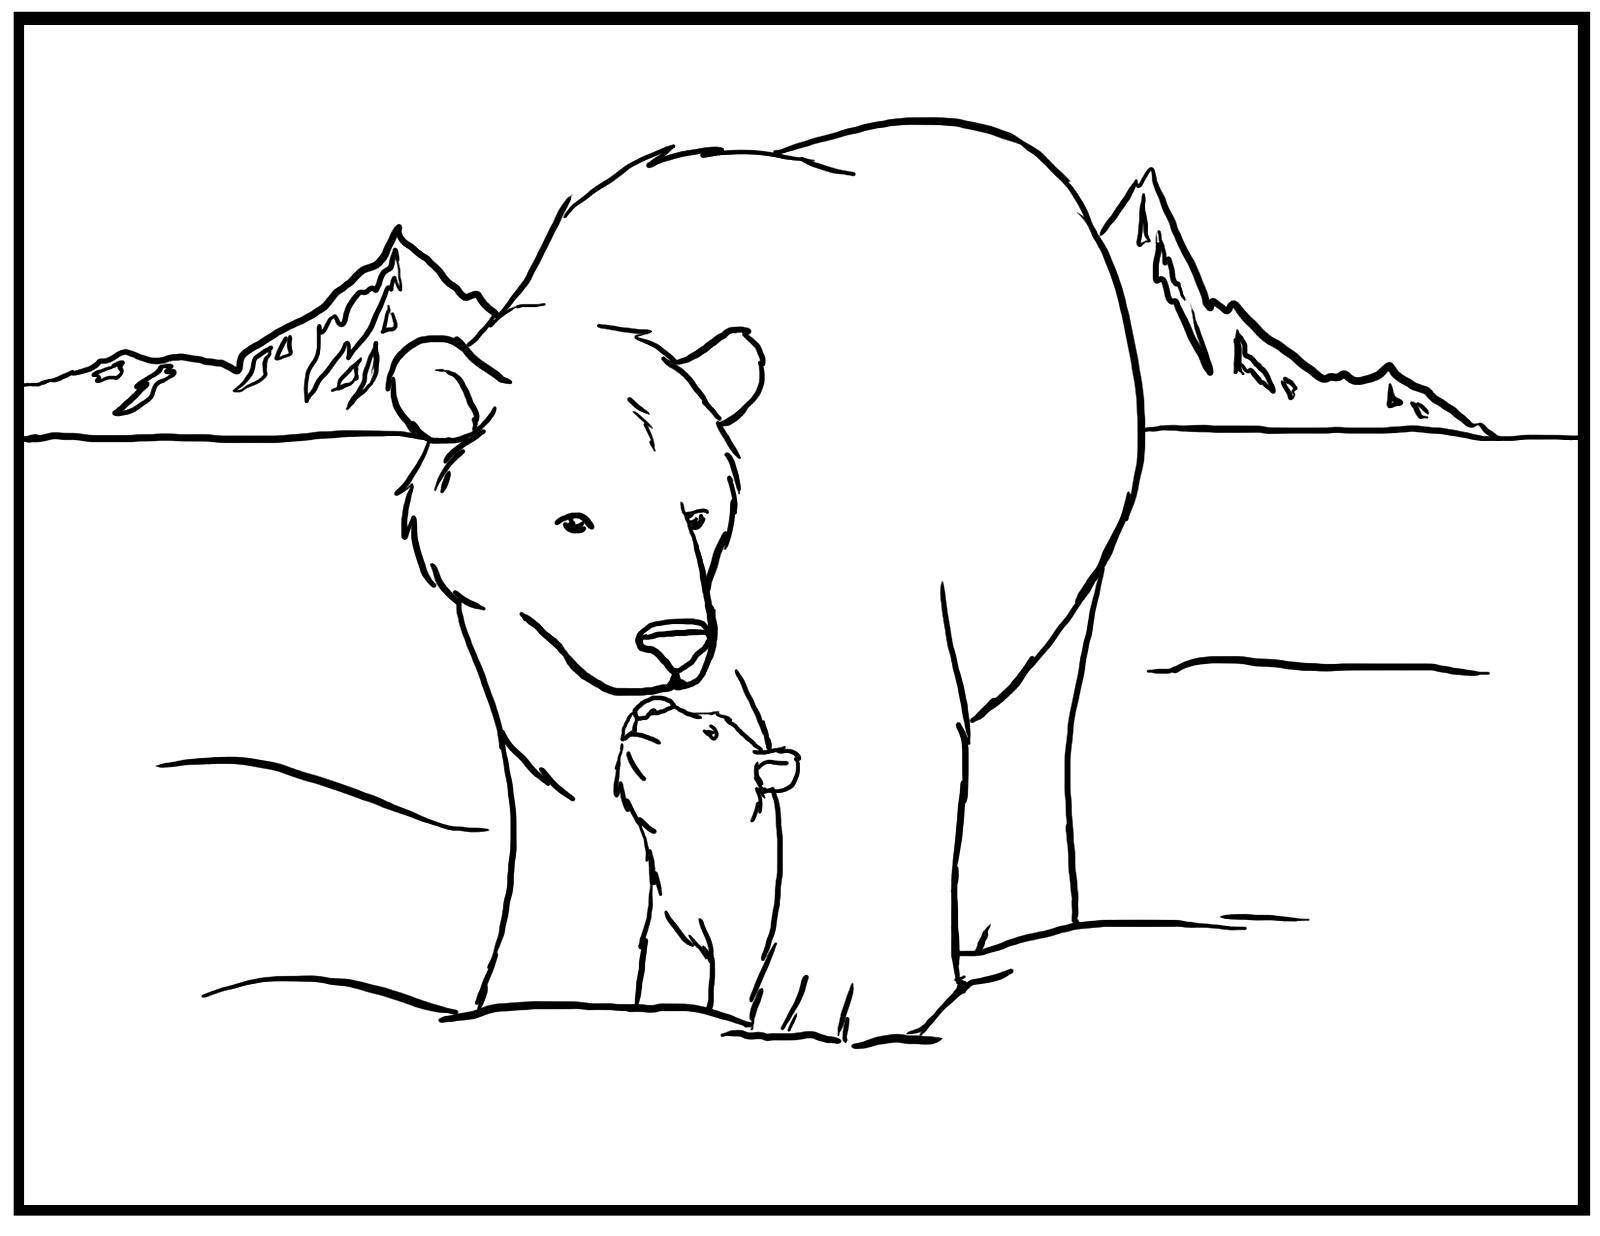 Drawn polar  bear printable Bear Draw Coloring Pages Coloring